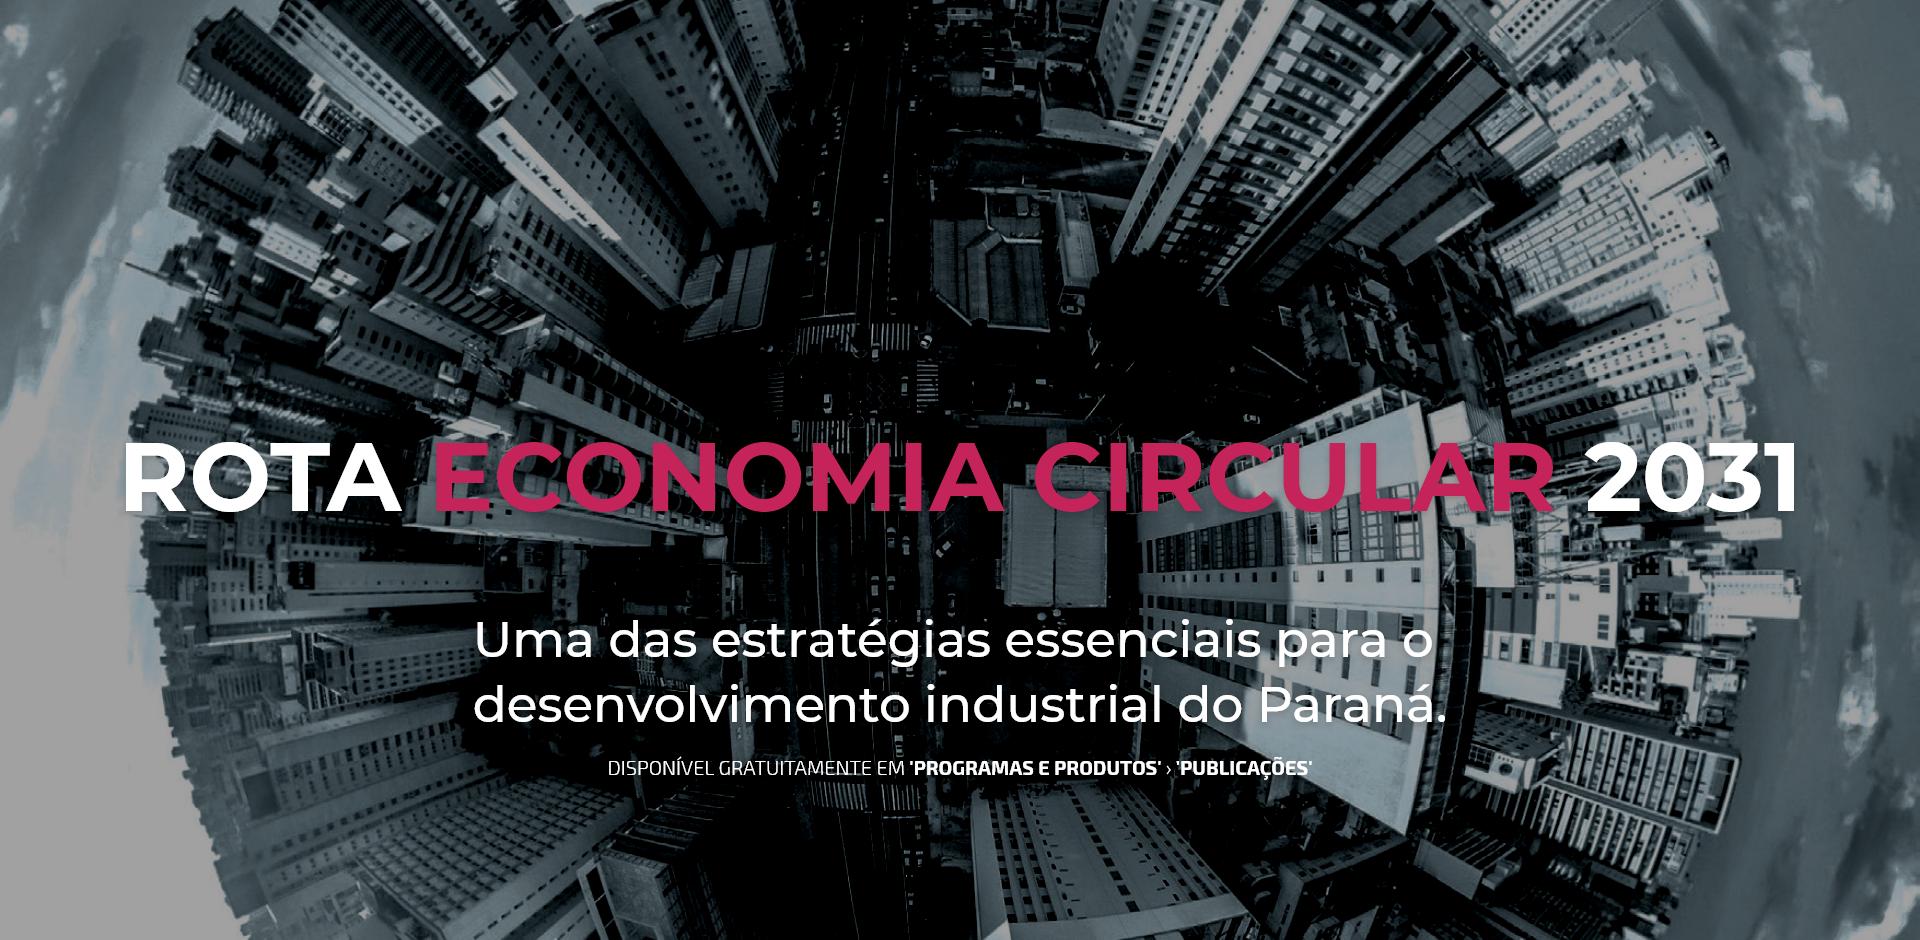 Rota Economia Circular 2031